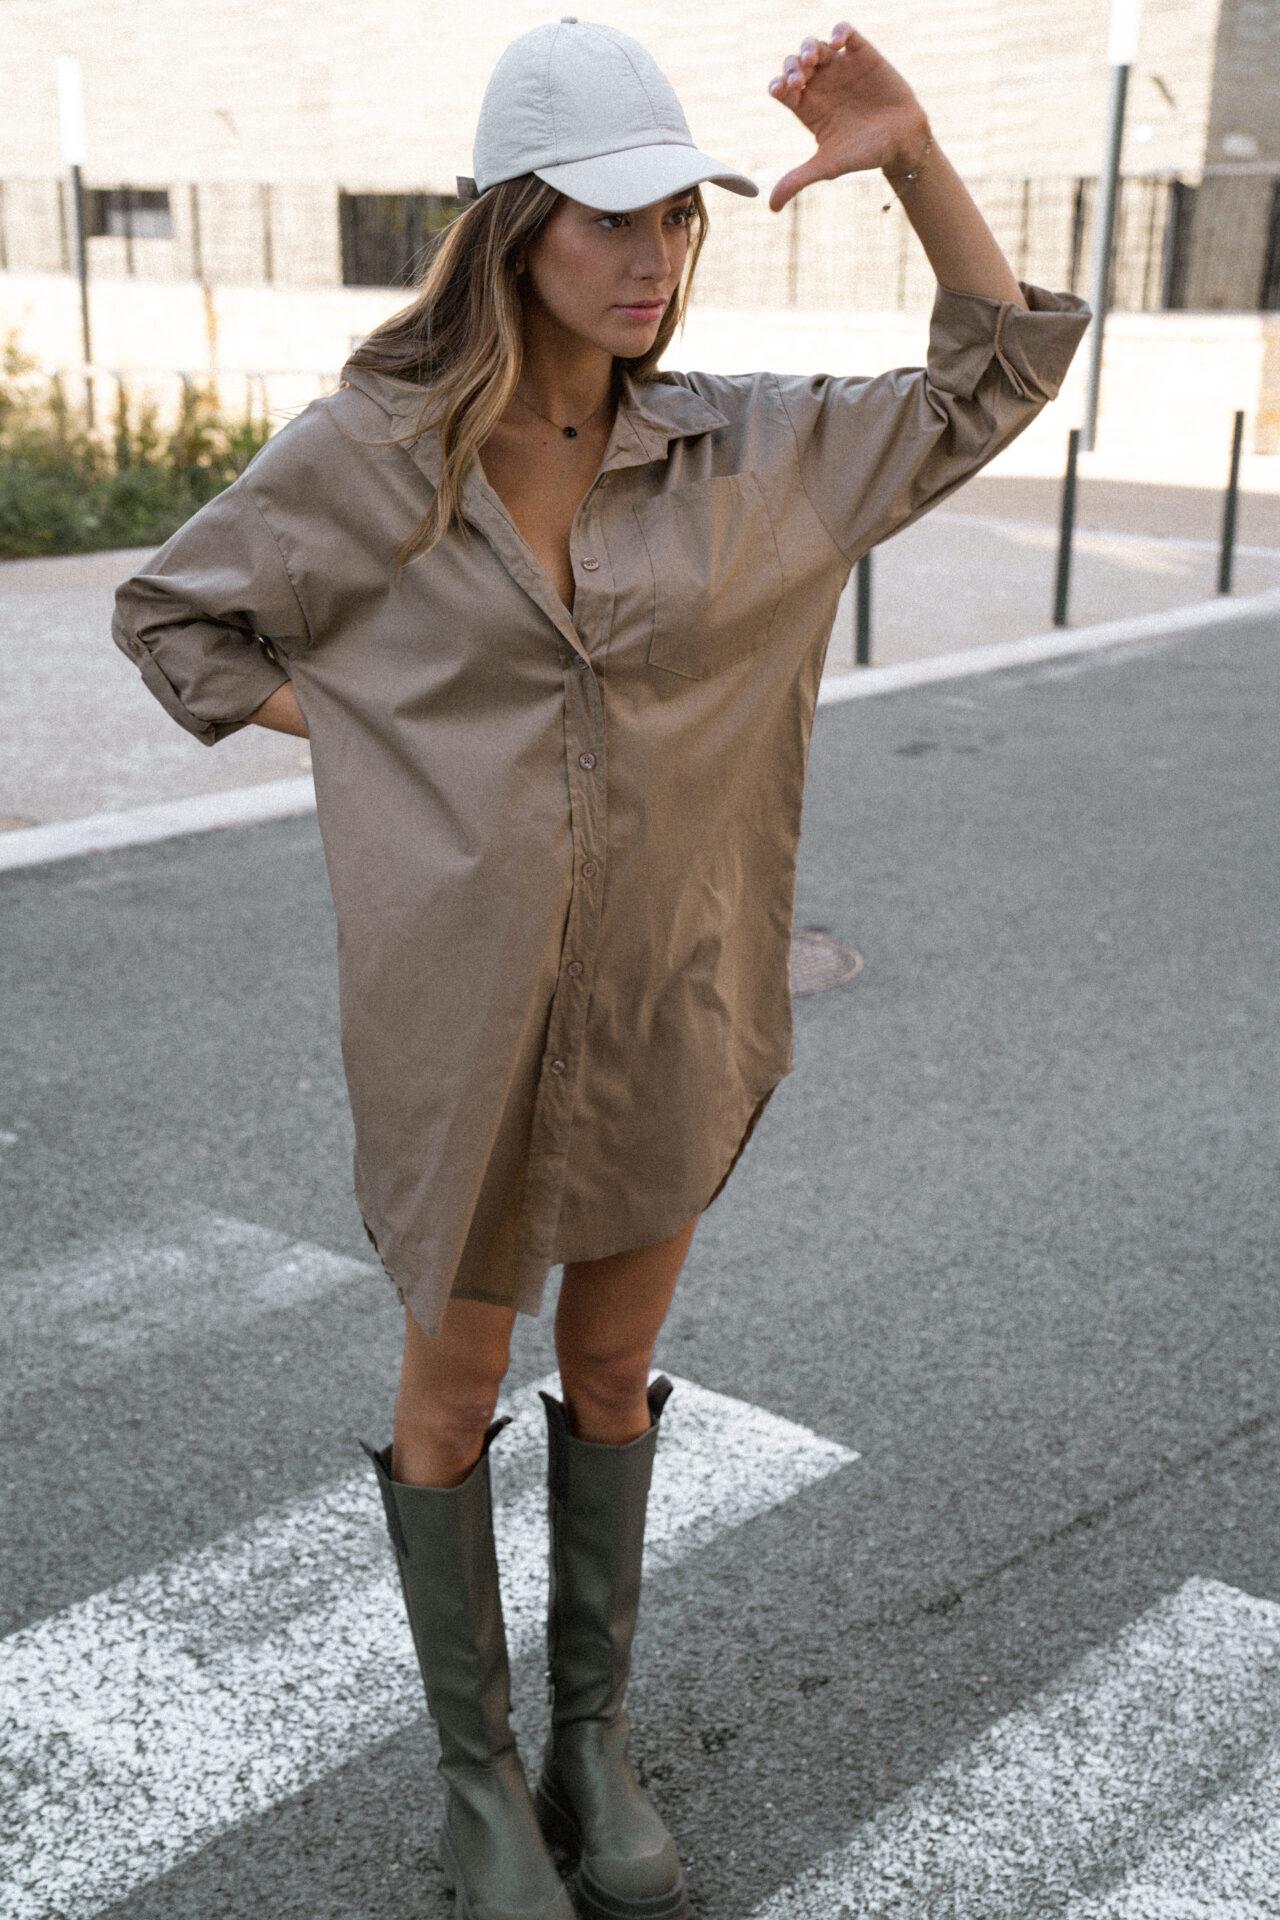 robe-chemise-beige-botte-de-pluie-casquette-femme-gisette-store (5)